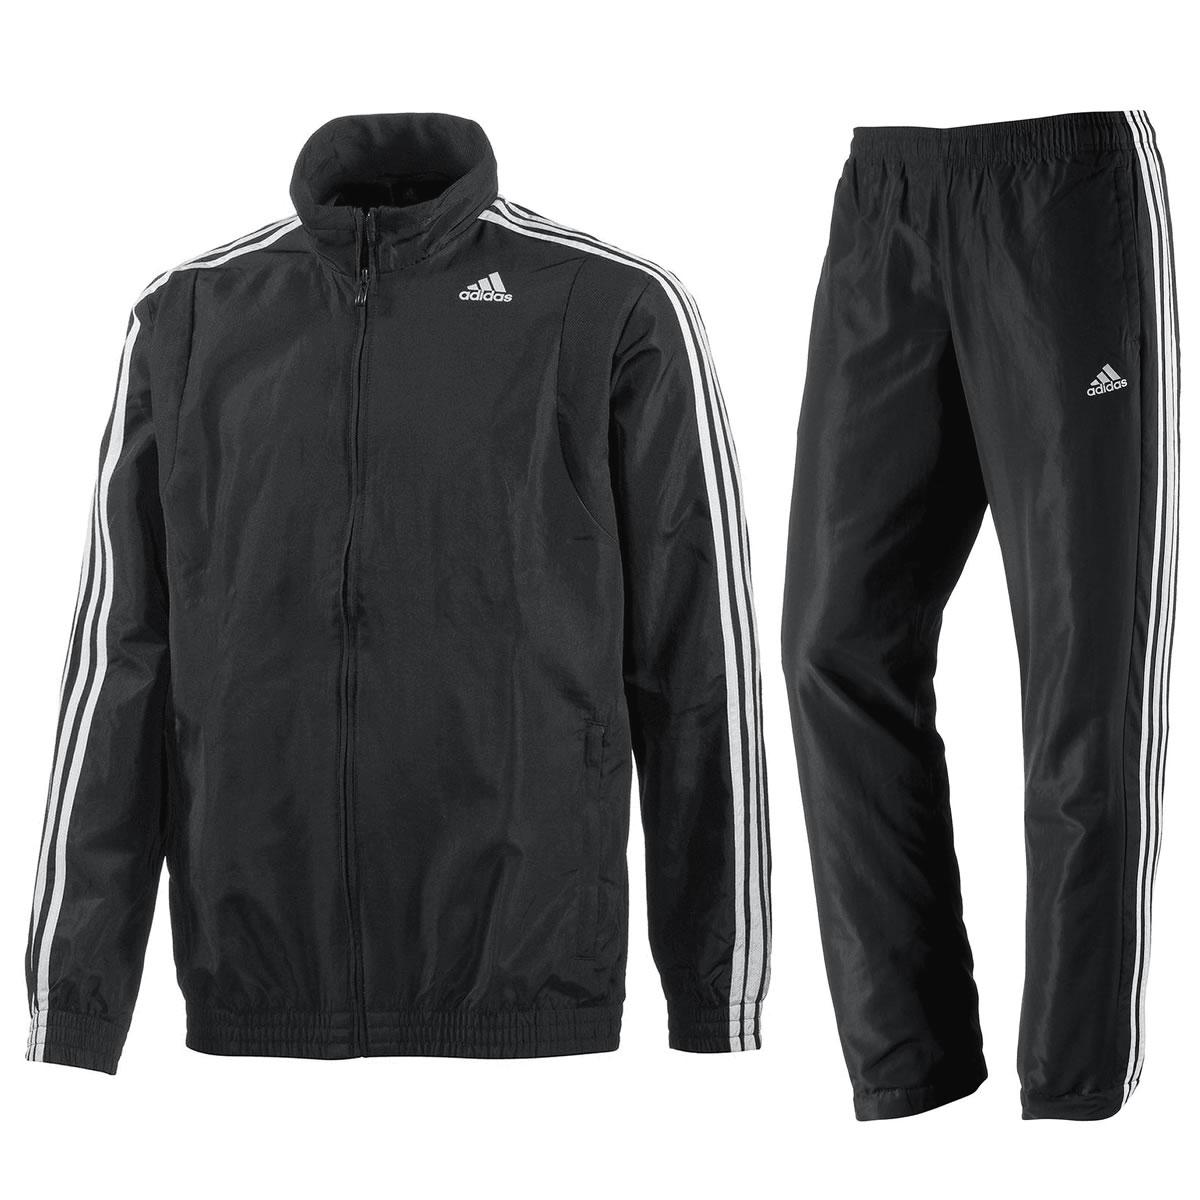 adidas Herren Trainingsanzug 3 Streifen Sportanzug